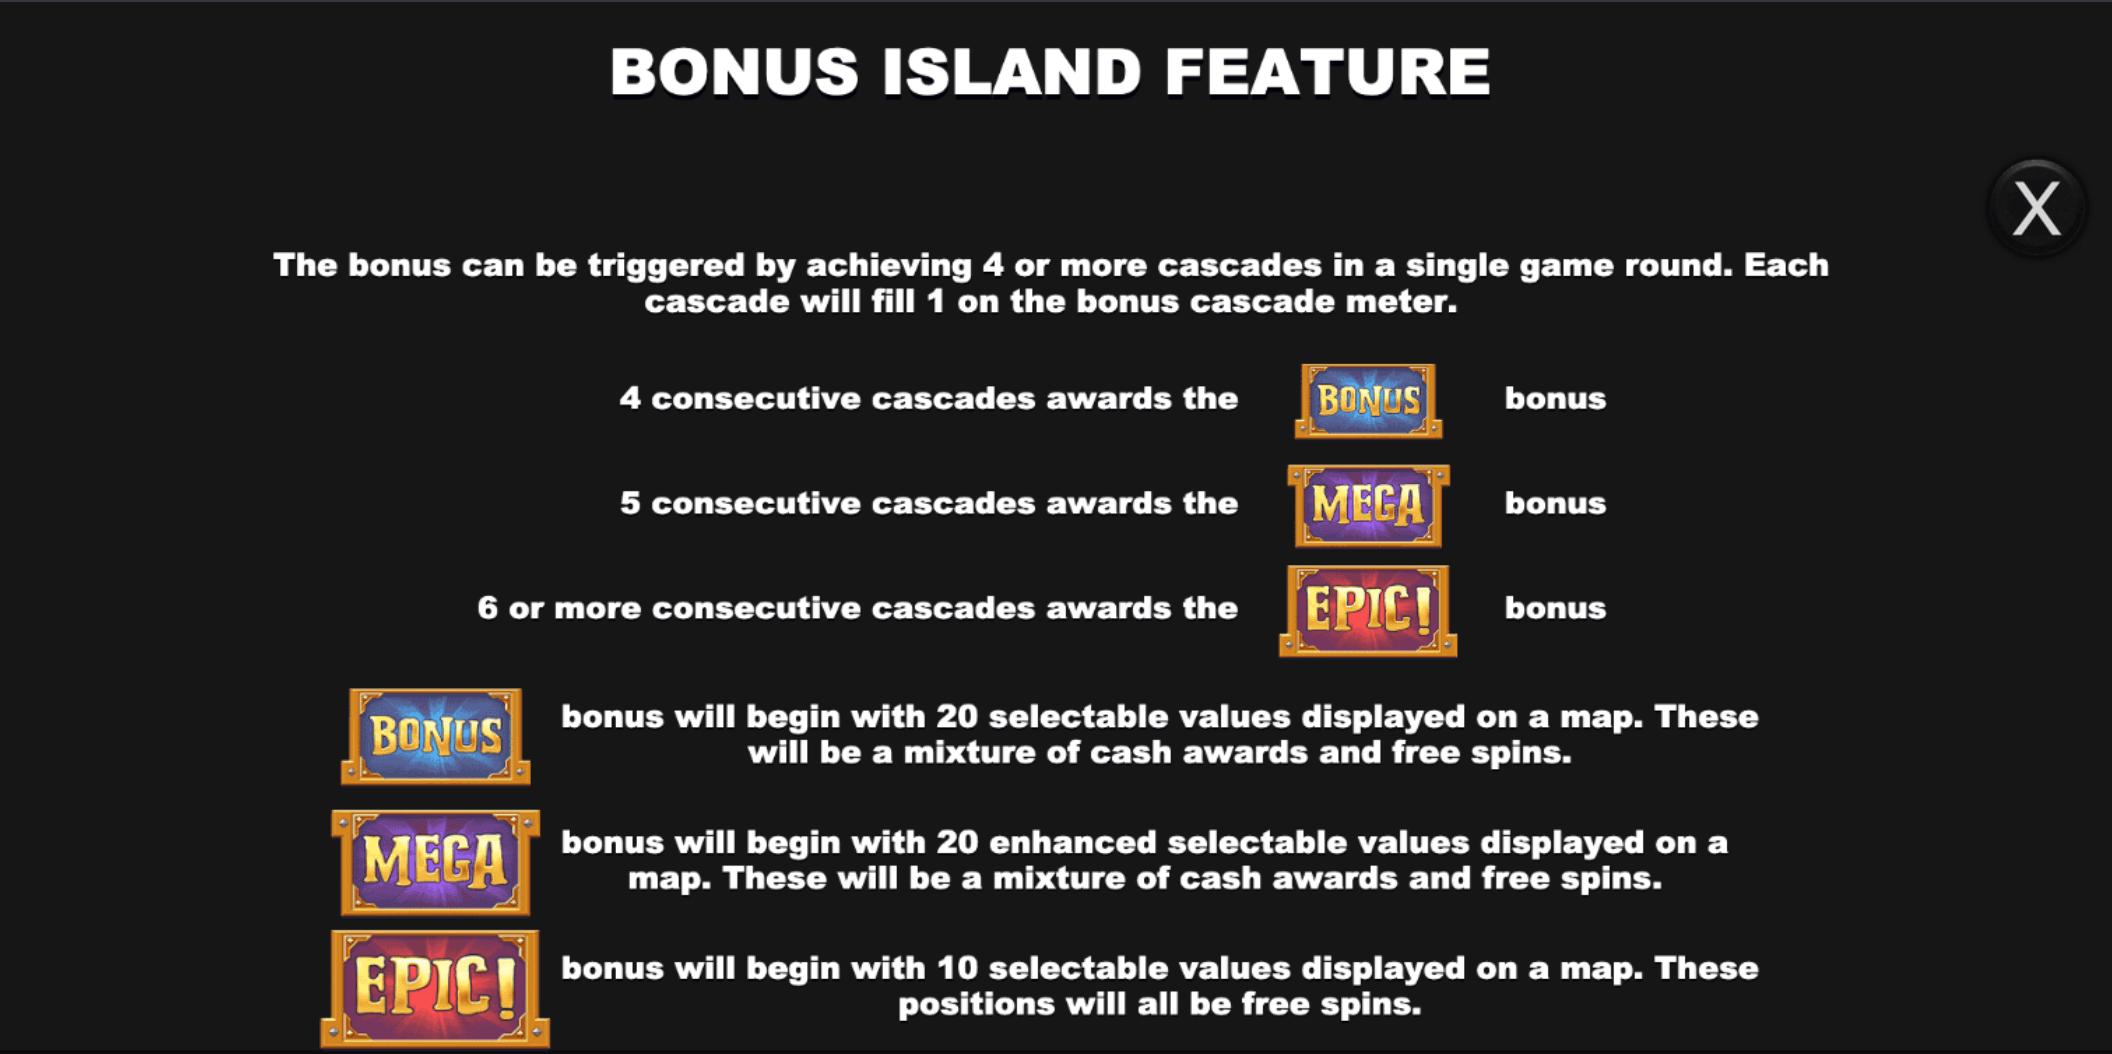 Bonus Island Bonus Feature